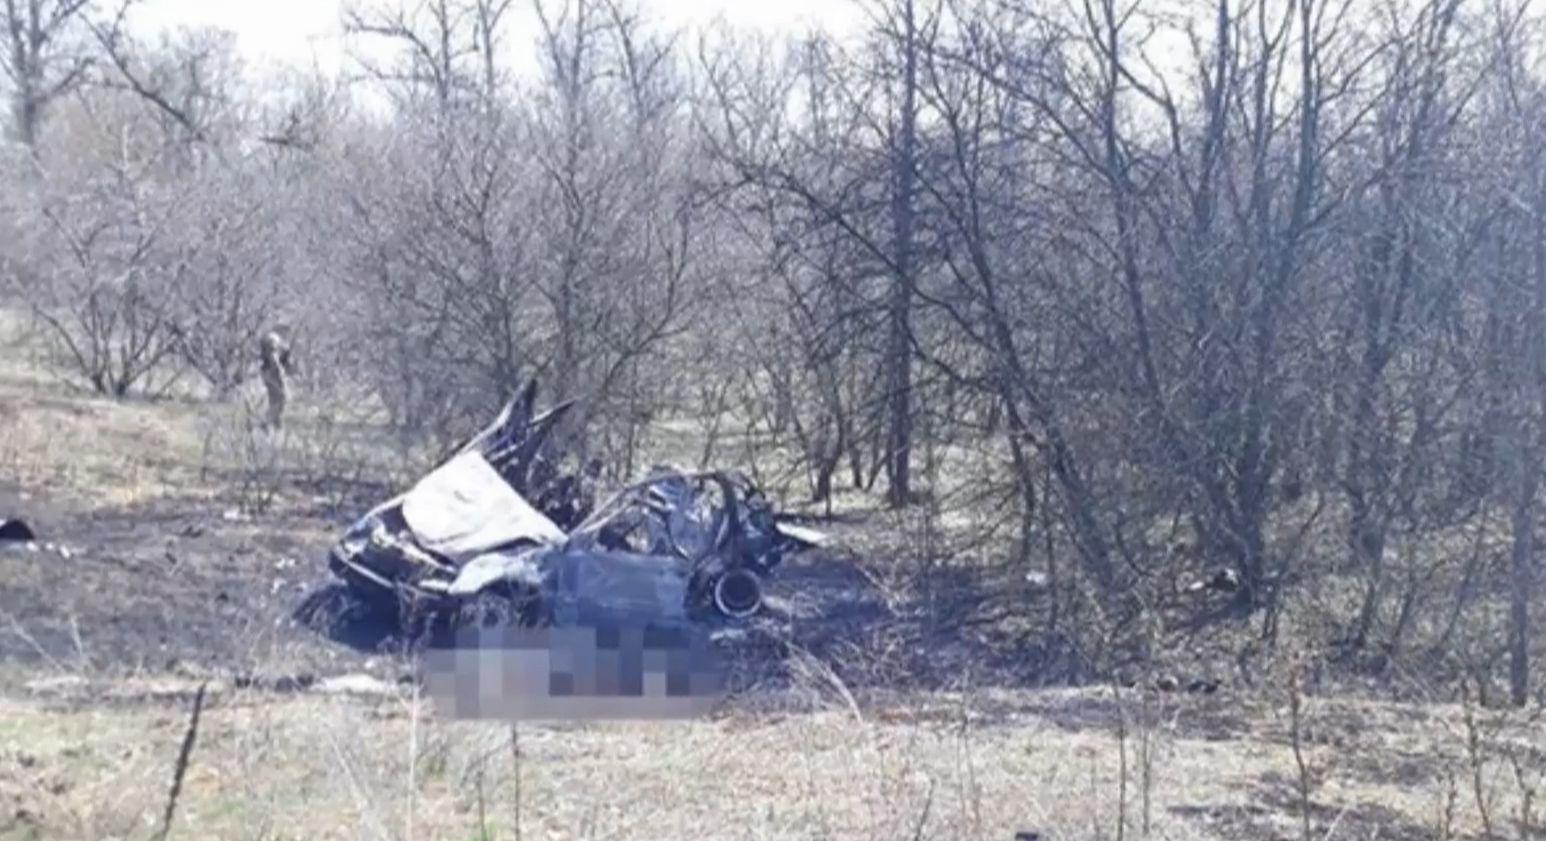 Целая семья подорвалась на мине на Луганщине